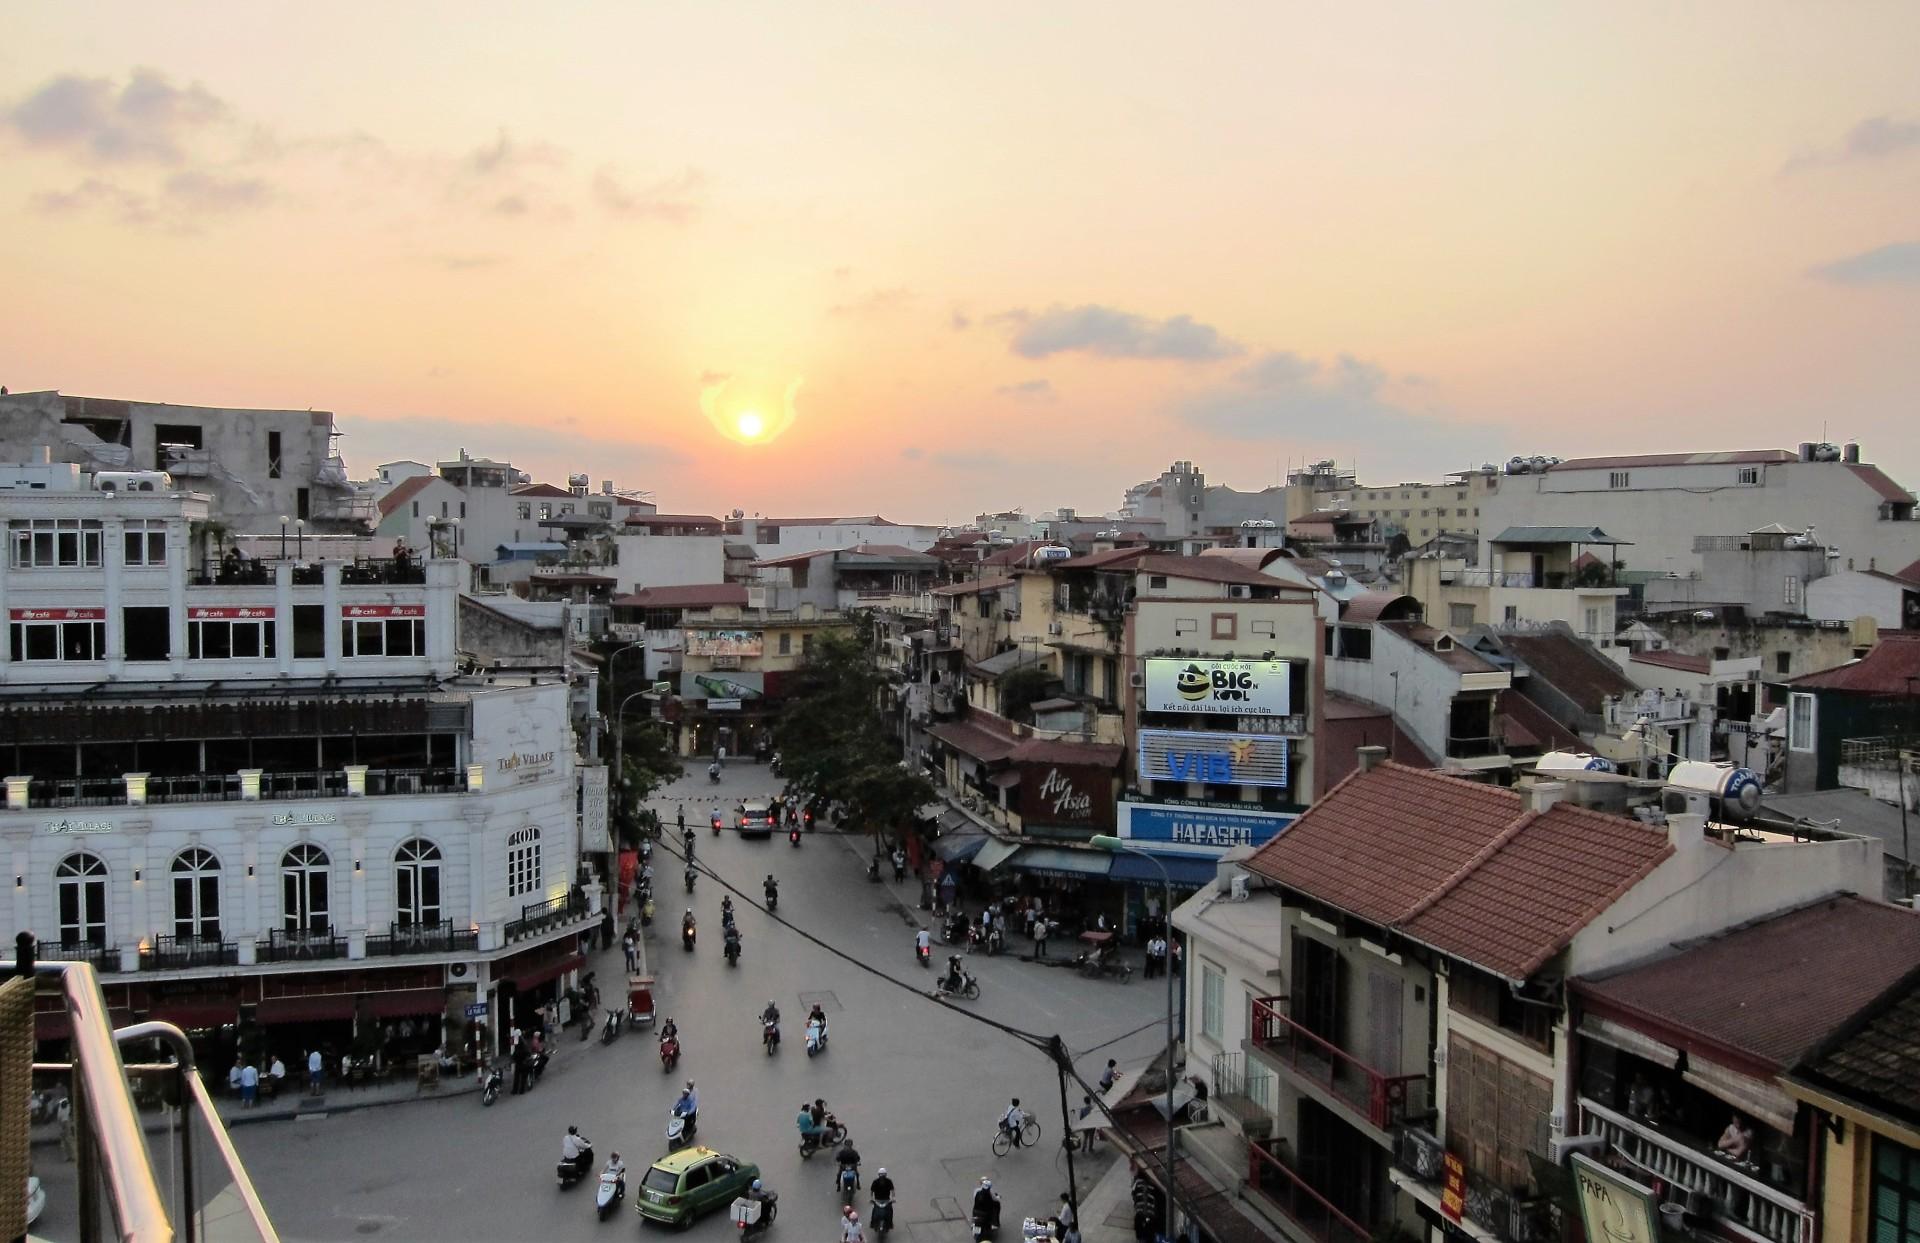 Sunset at Hanoi Old Quarters